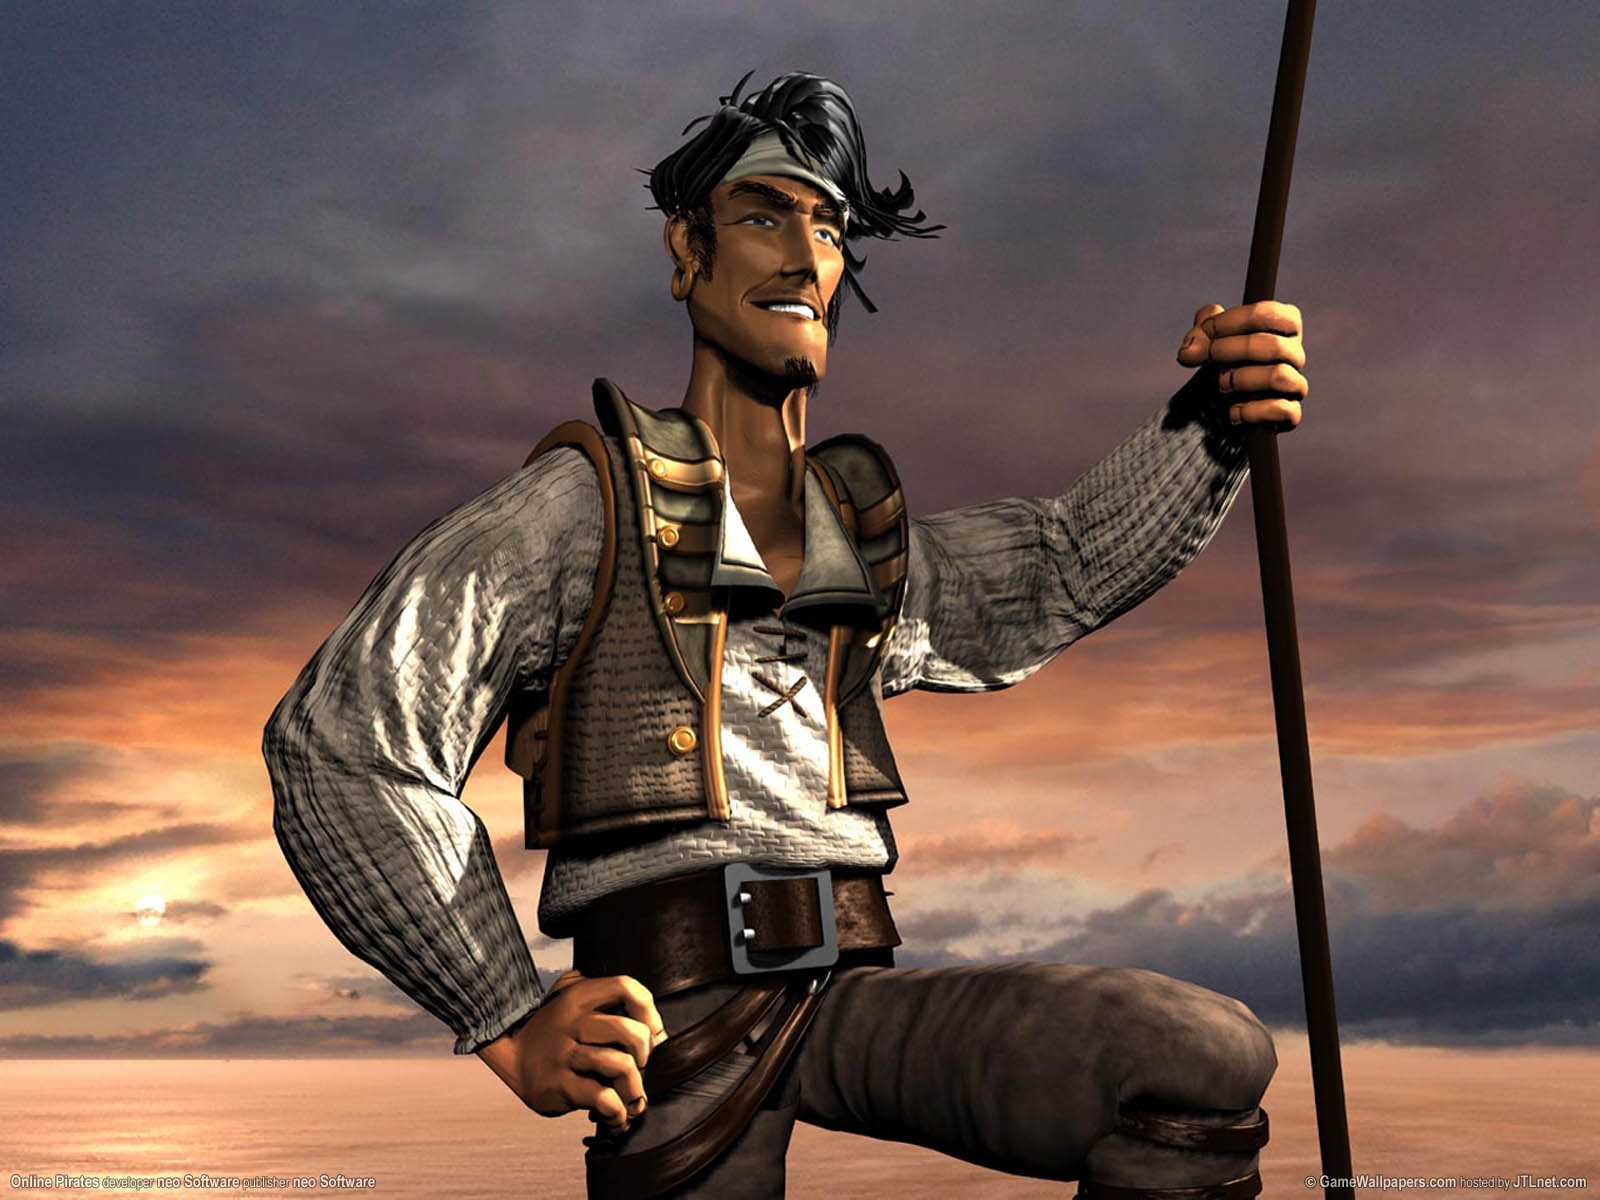 Online Pirates wallpaper 02 1600x1200